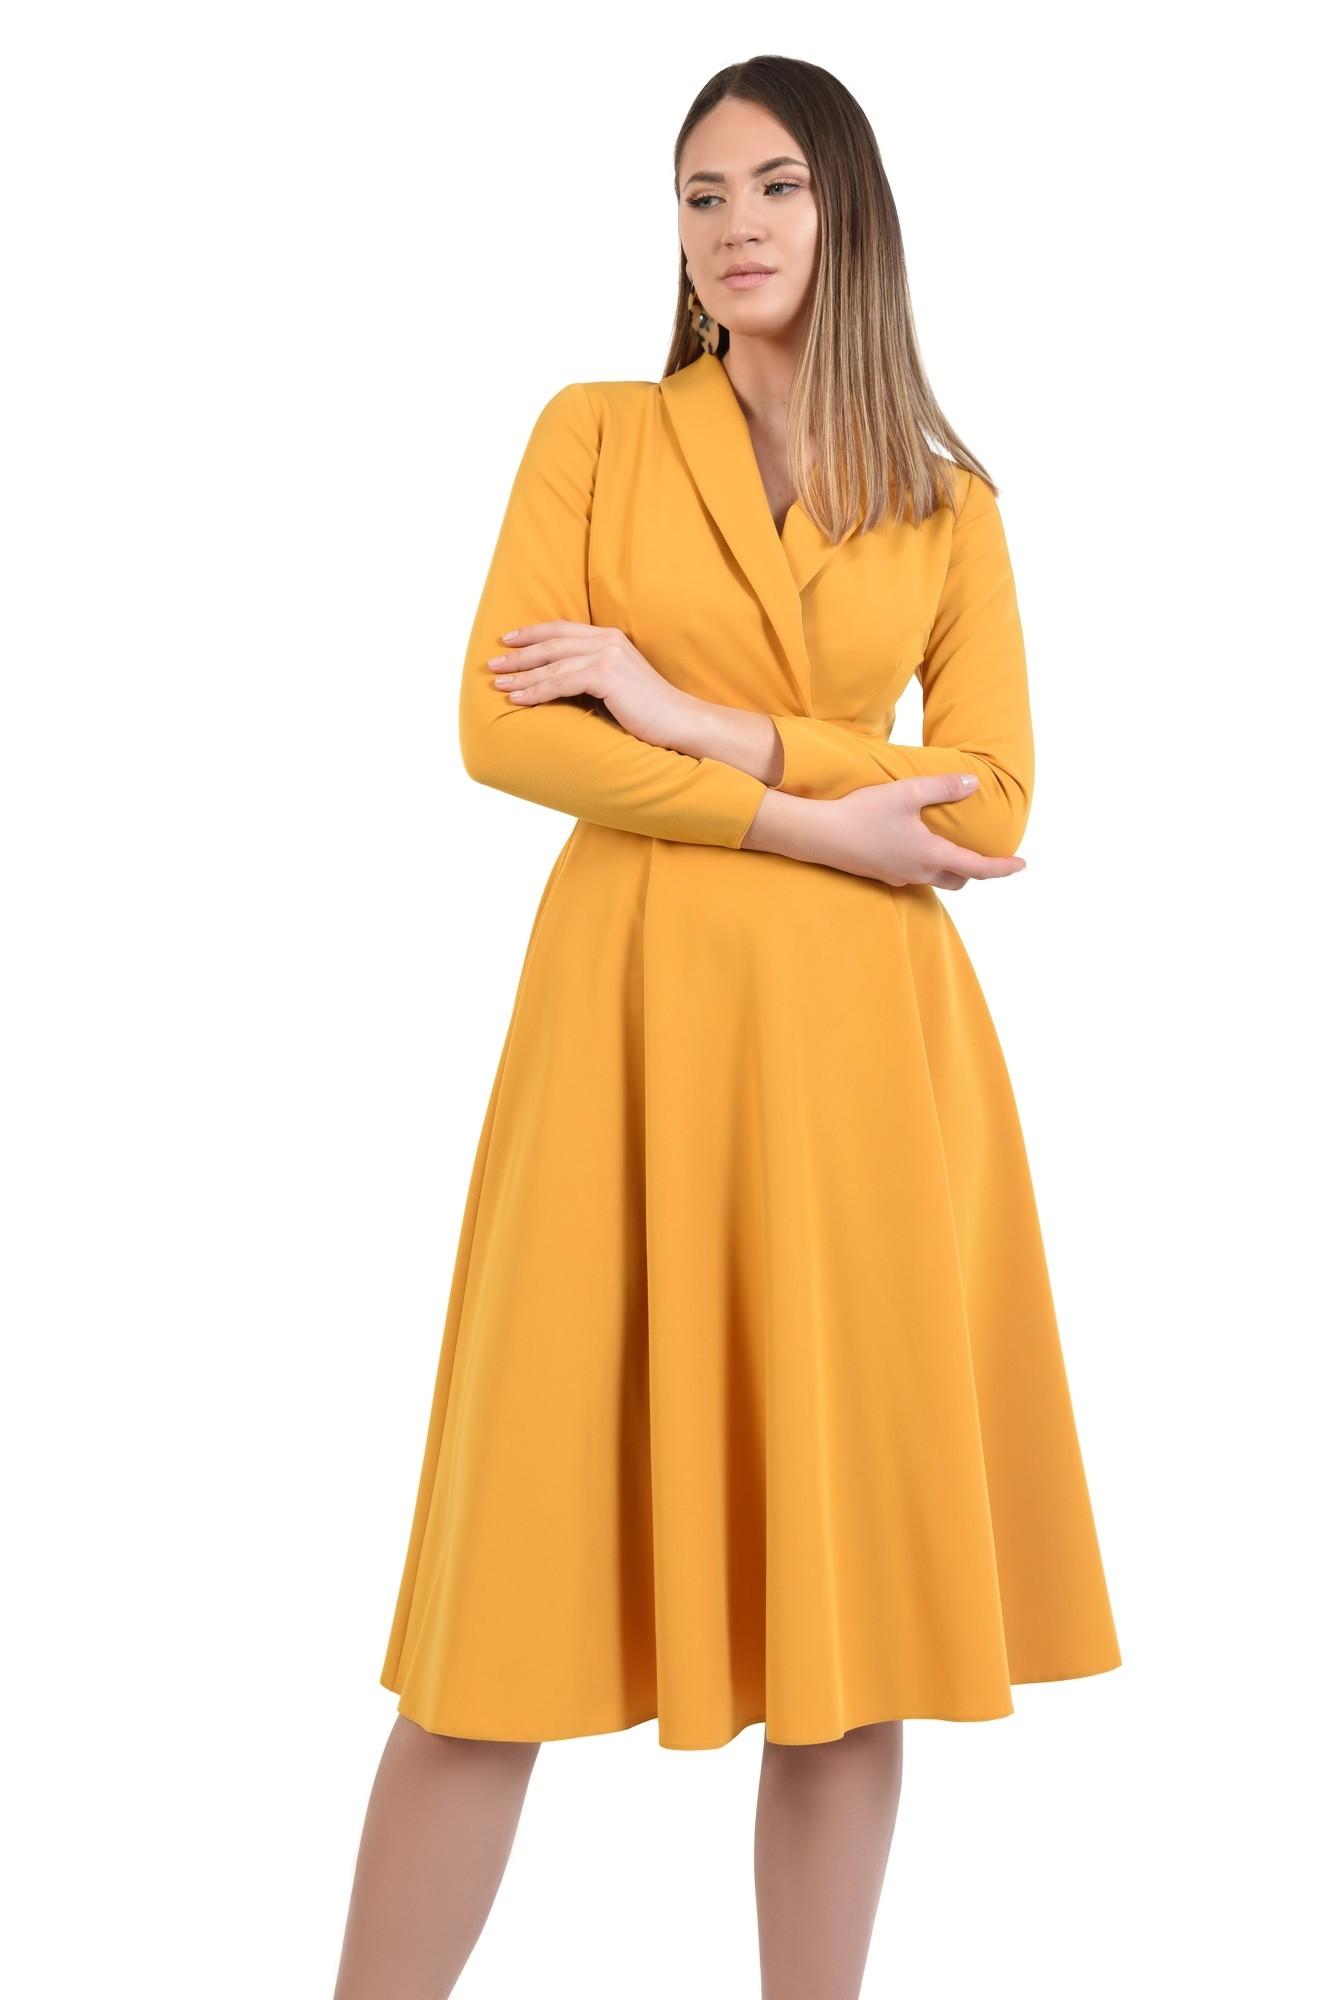 0 - rochie eleganta, de zi, mustar, maneci ajustate, anchior petrecut